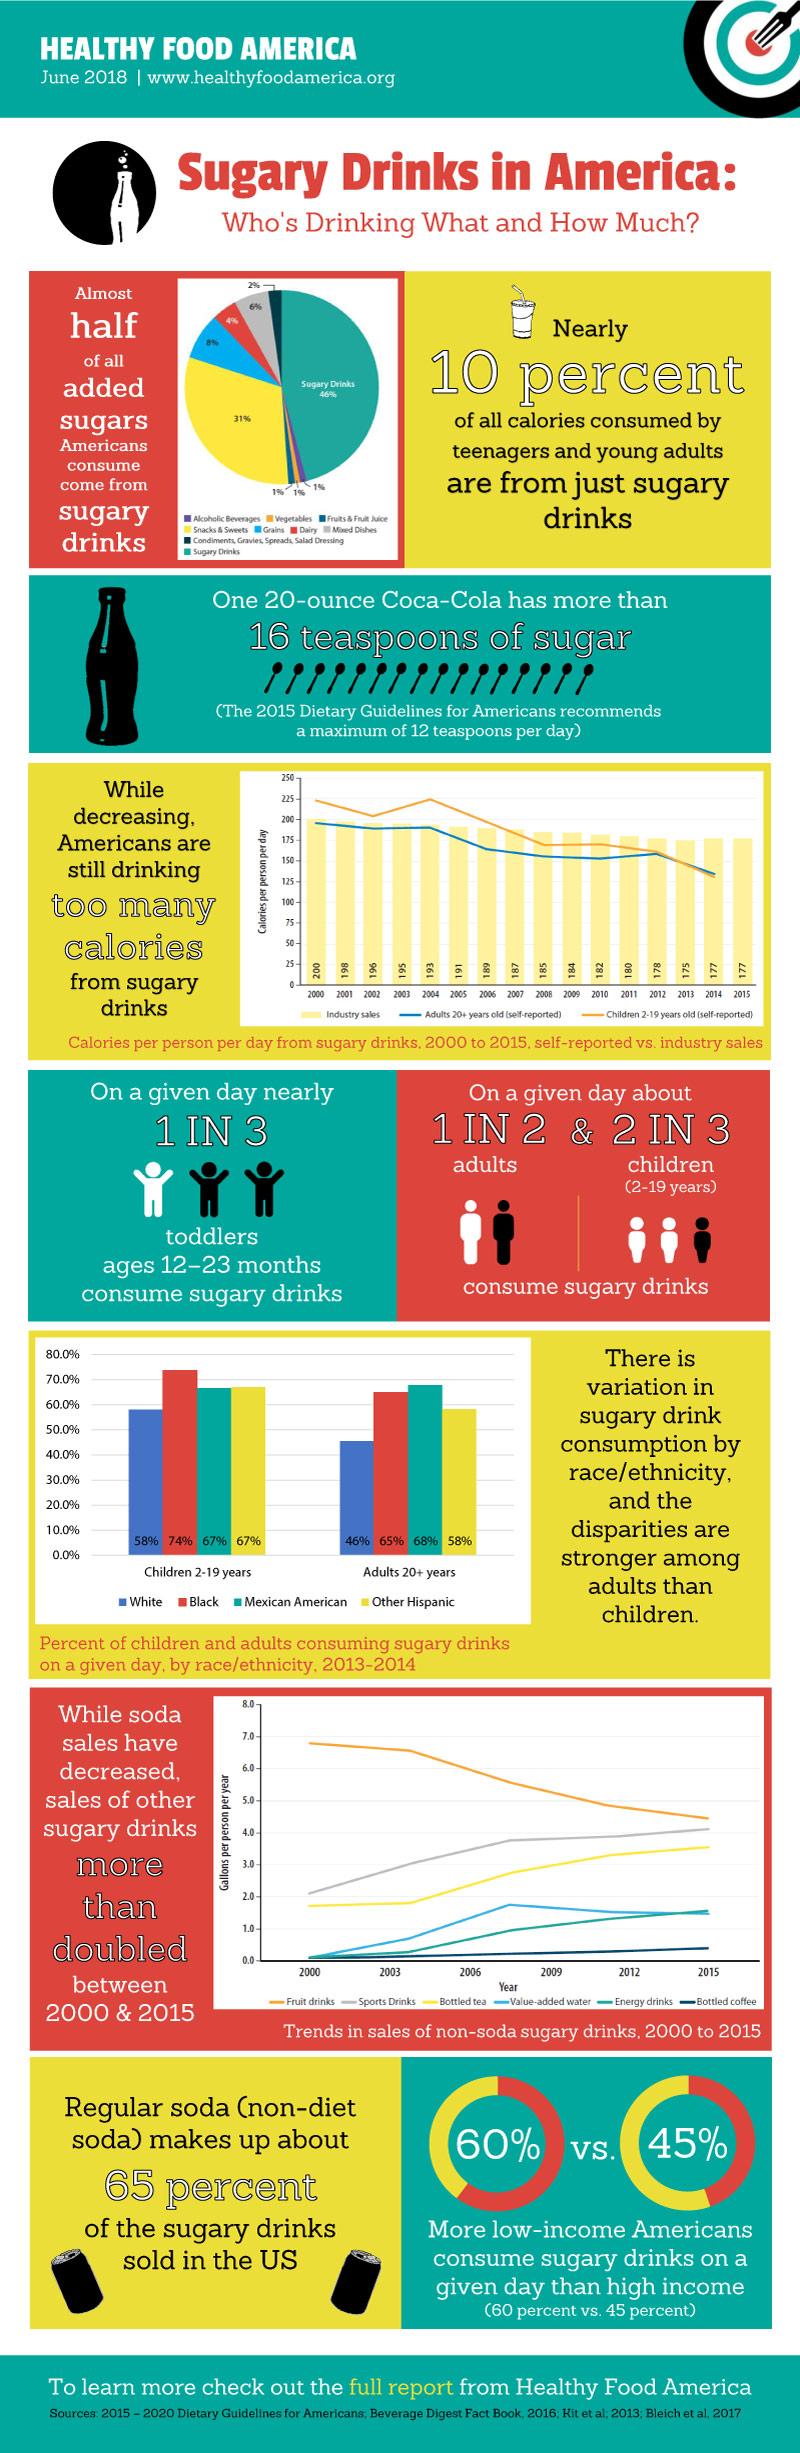 HFA-SSB-Report-Infographic.jpg